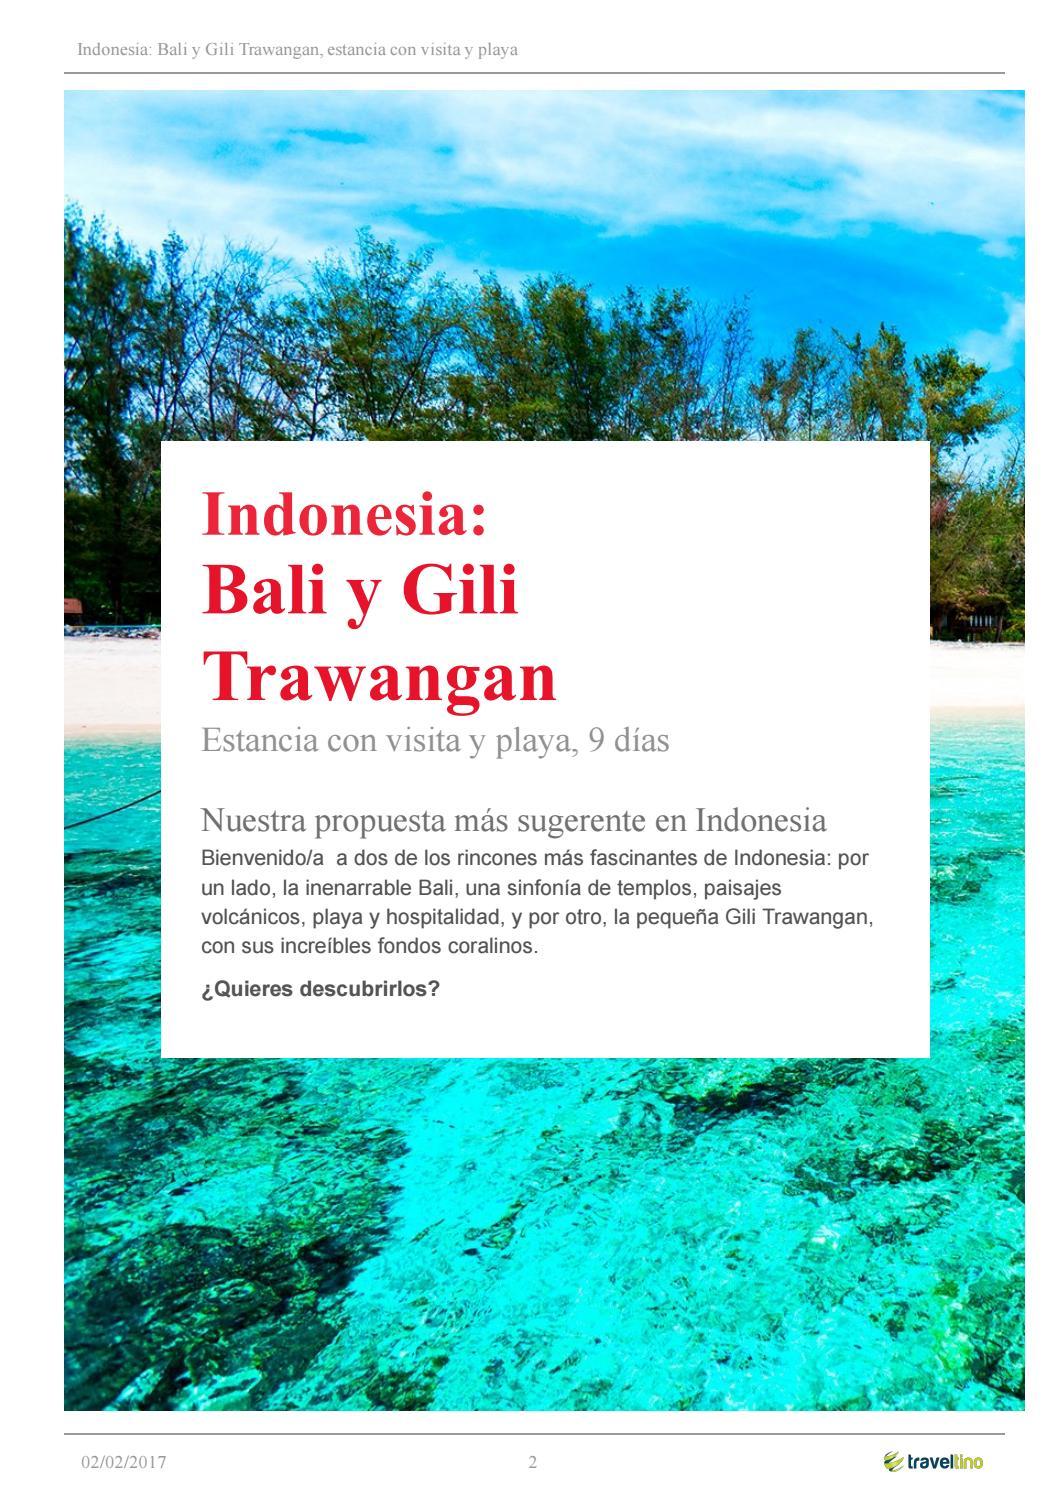 Indonesia, bali y gili trawangan by Kerala Viajes - issuu